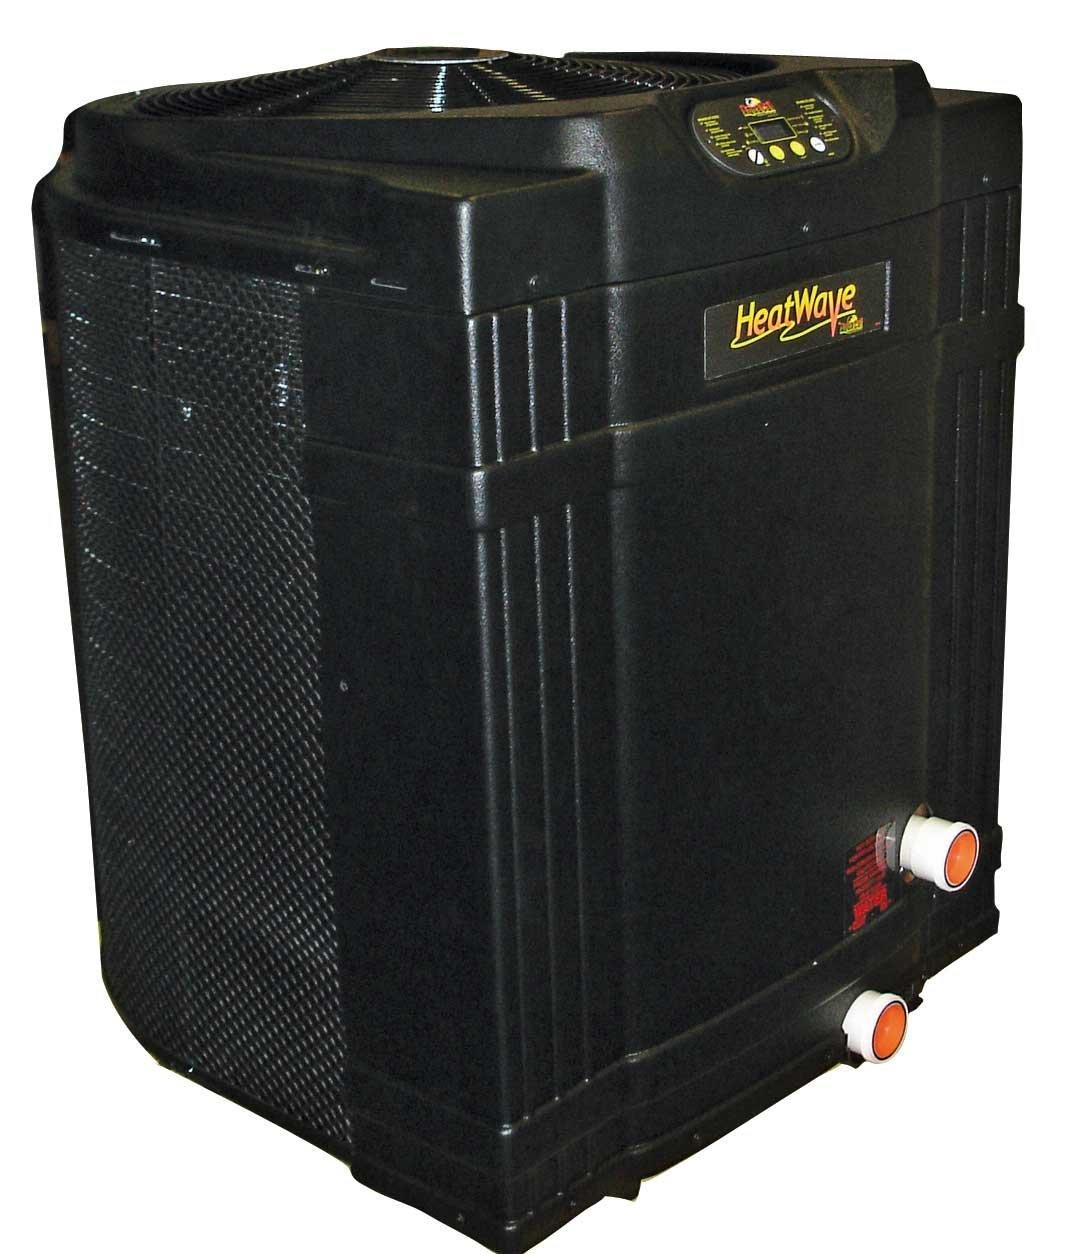 Hayward pool heater wiring diagram hayward pool heater for Pool heater